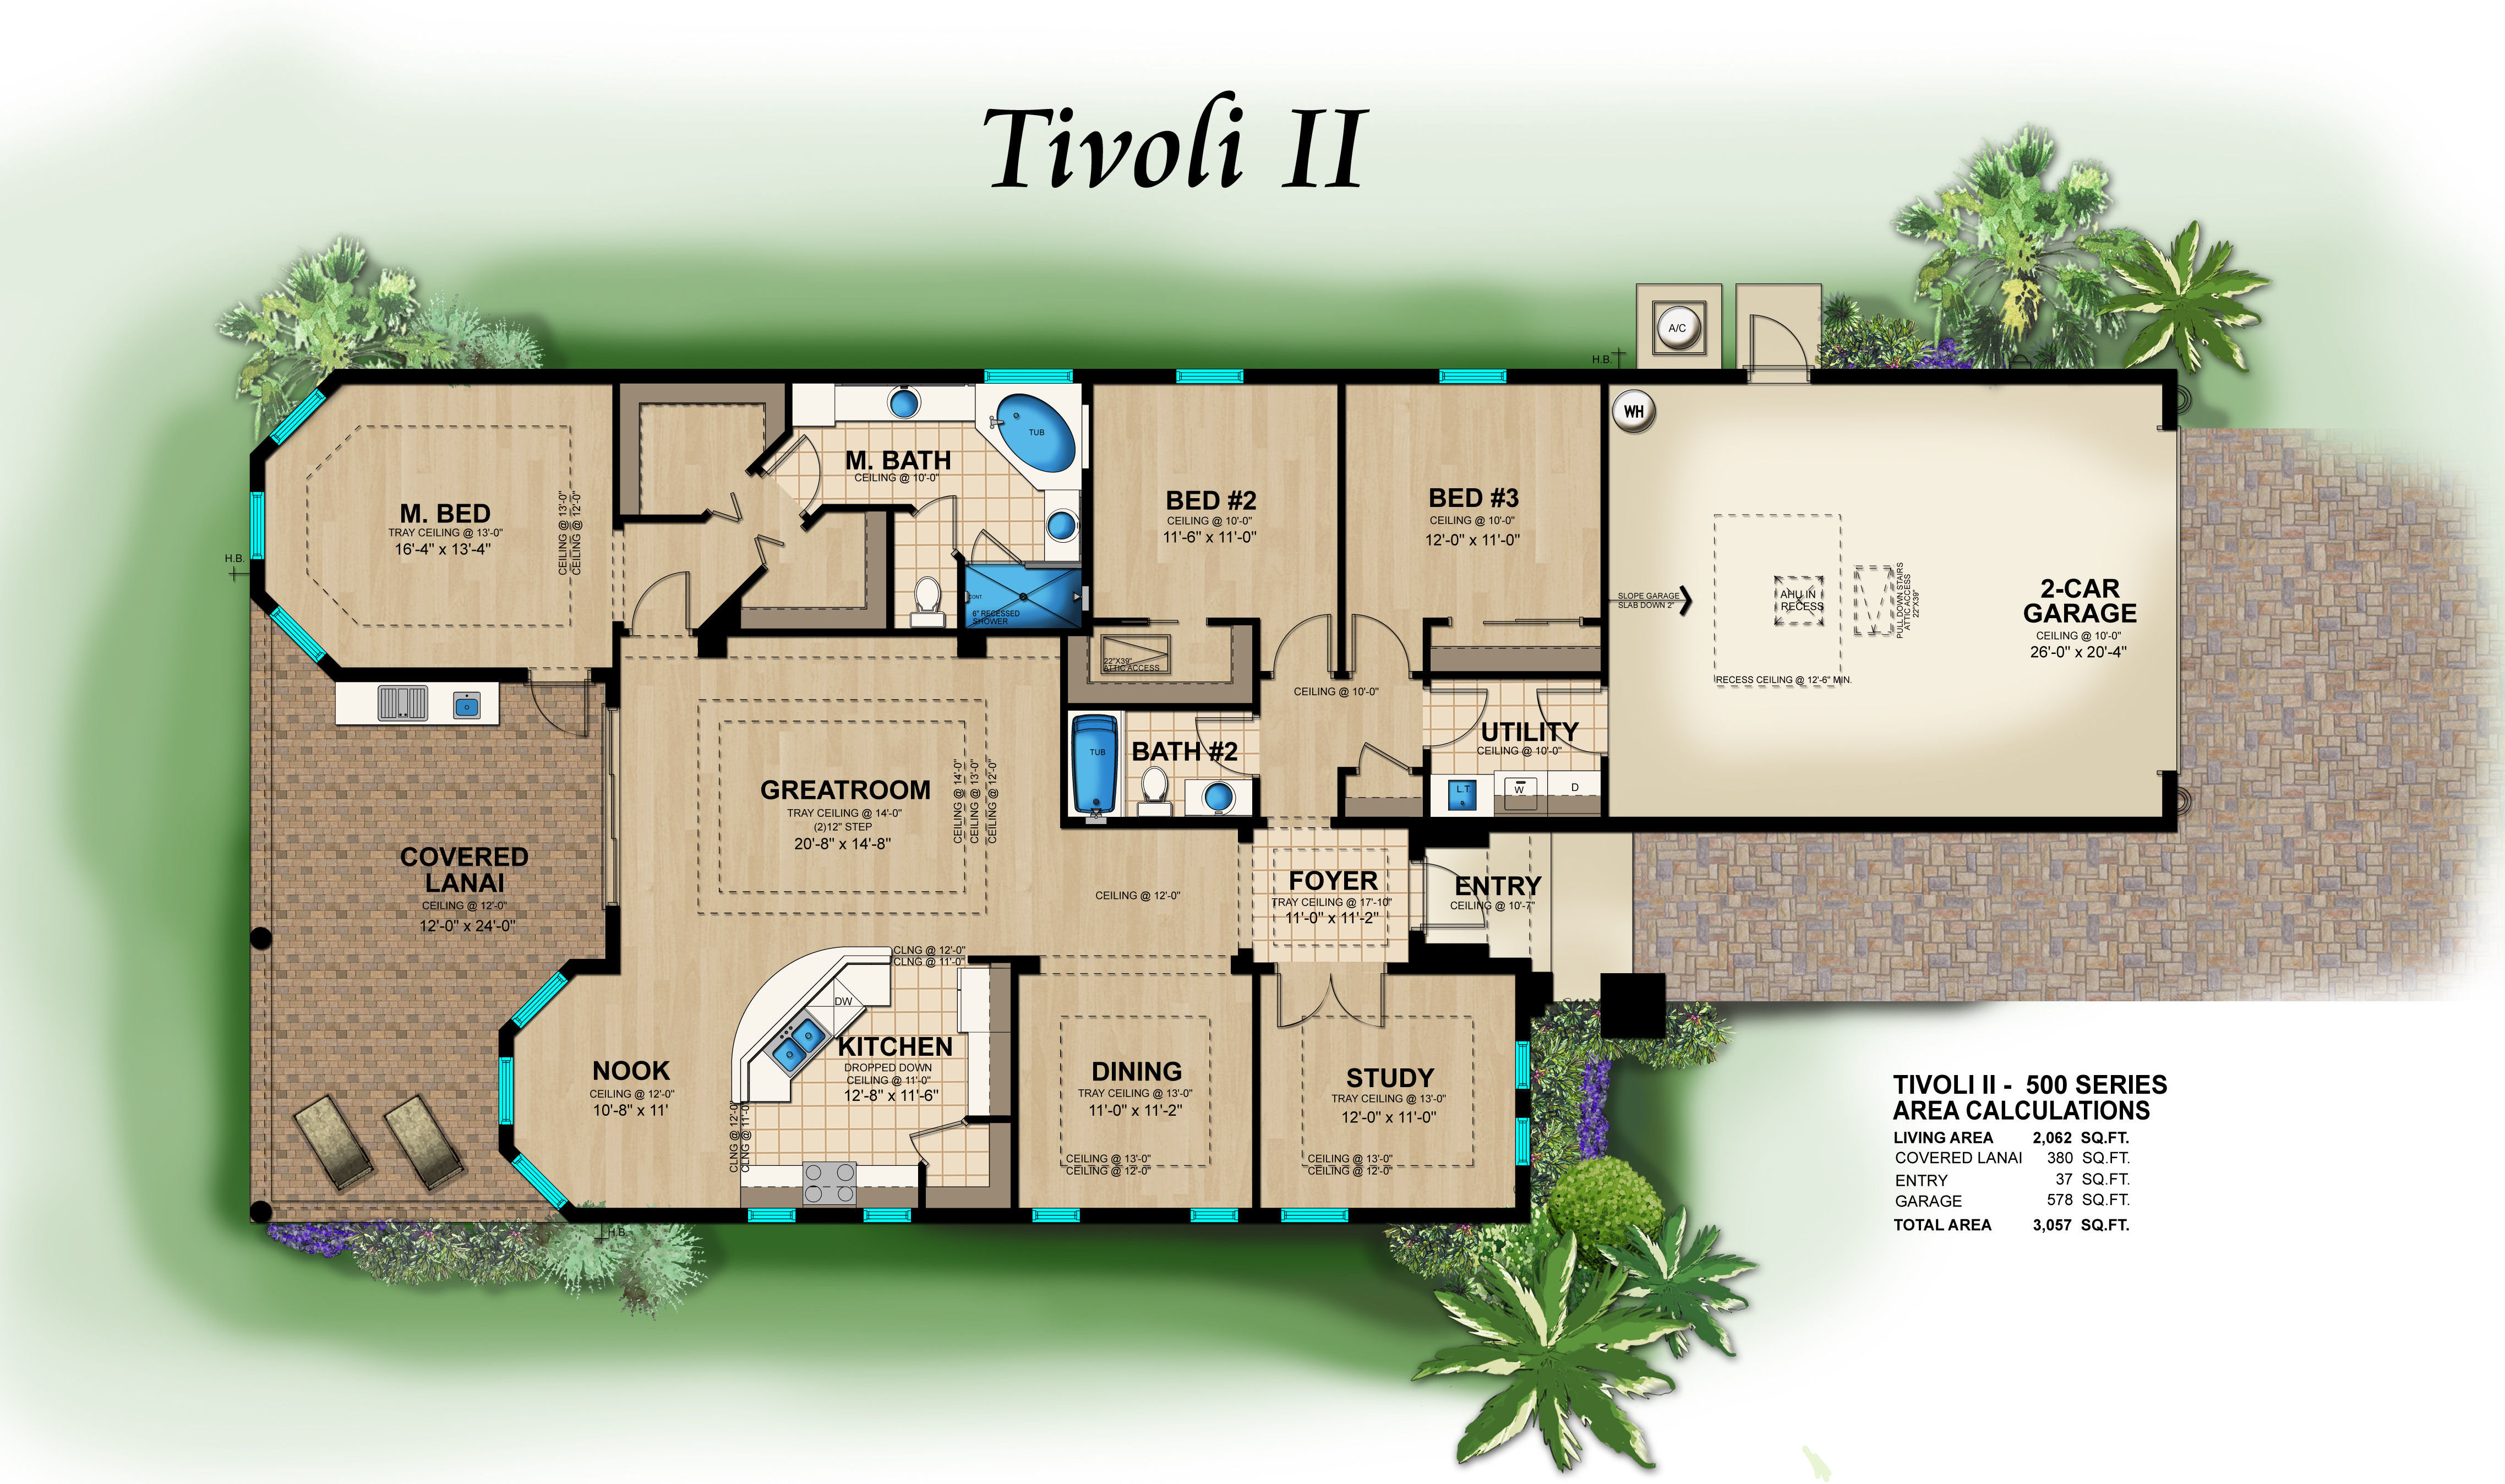 lennar tivoli floor plan home free home design ideas images